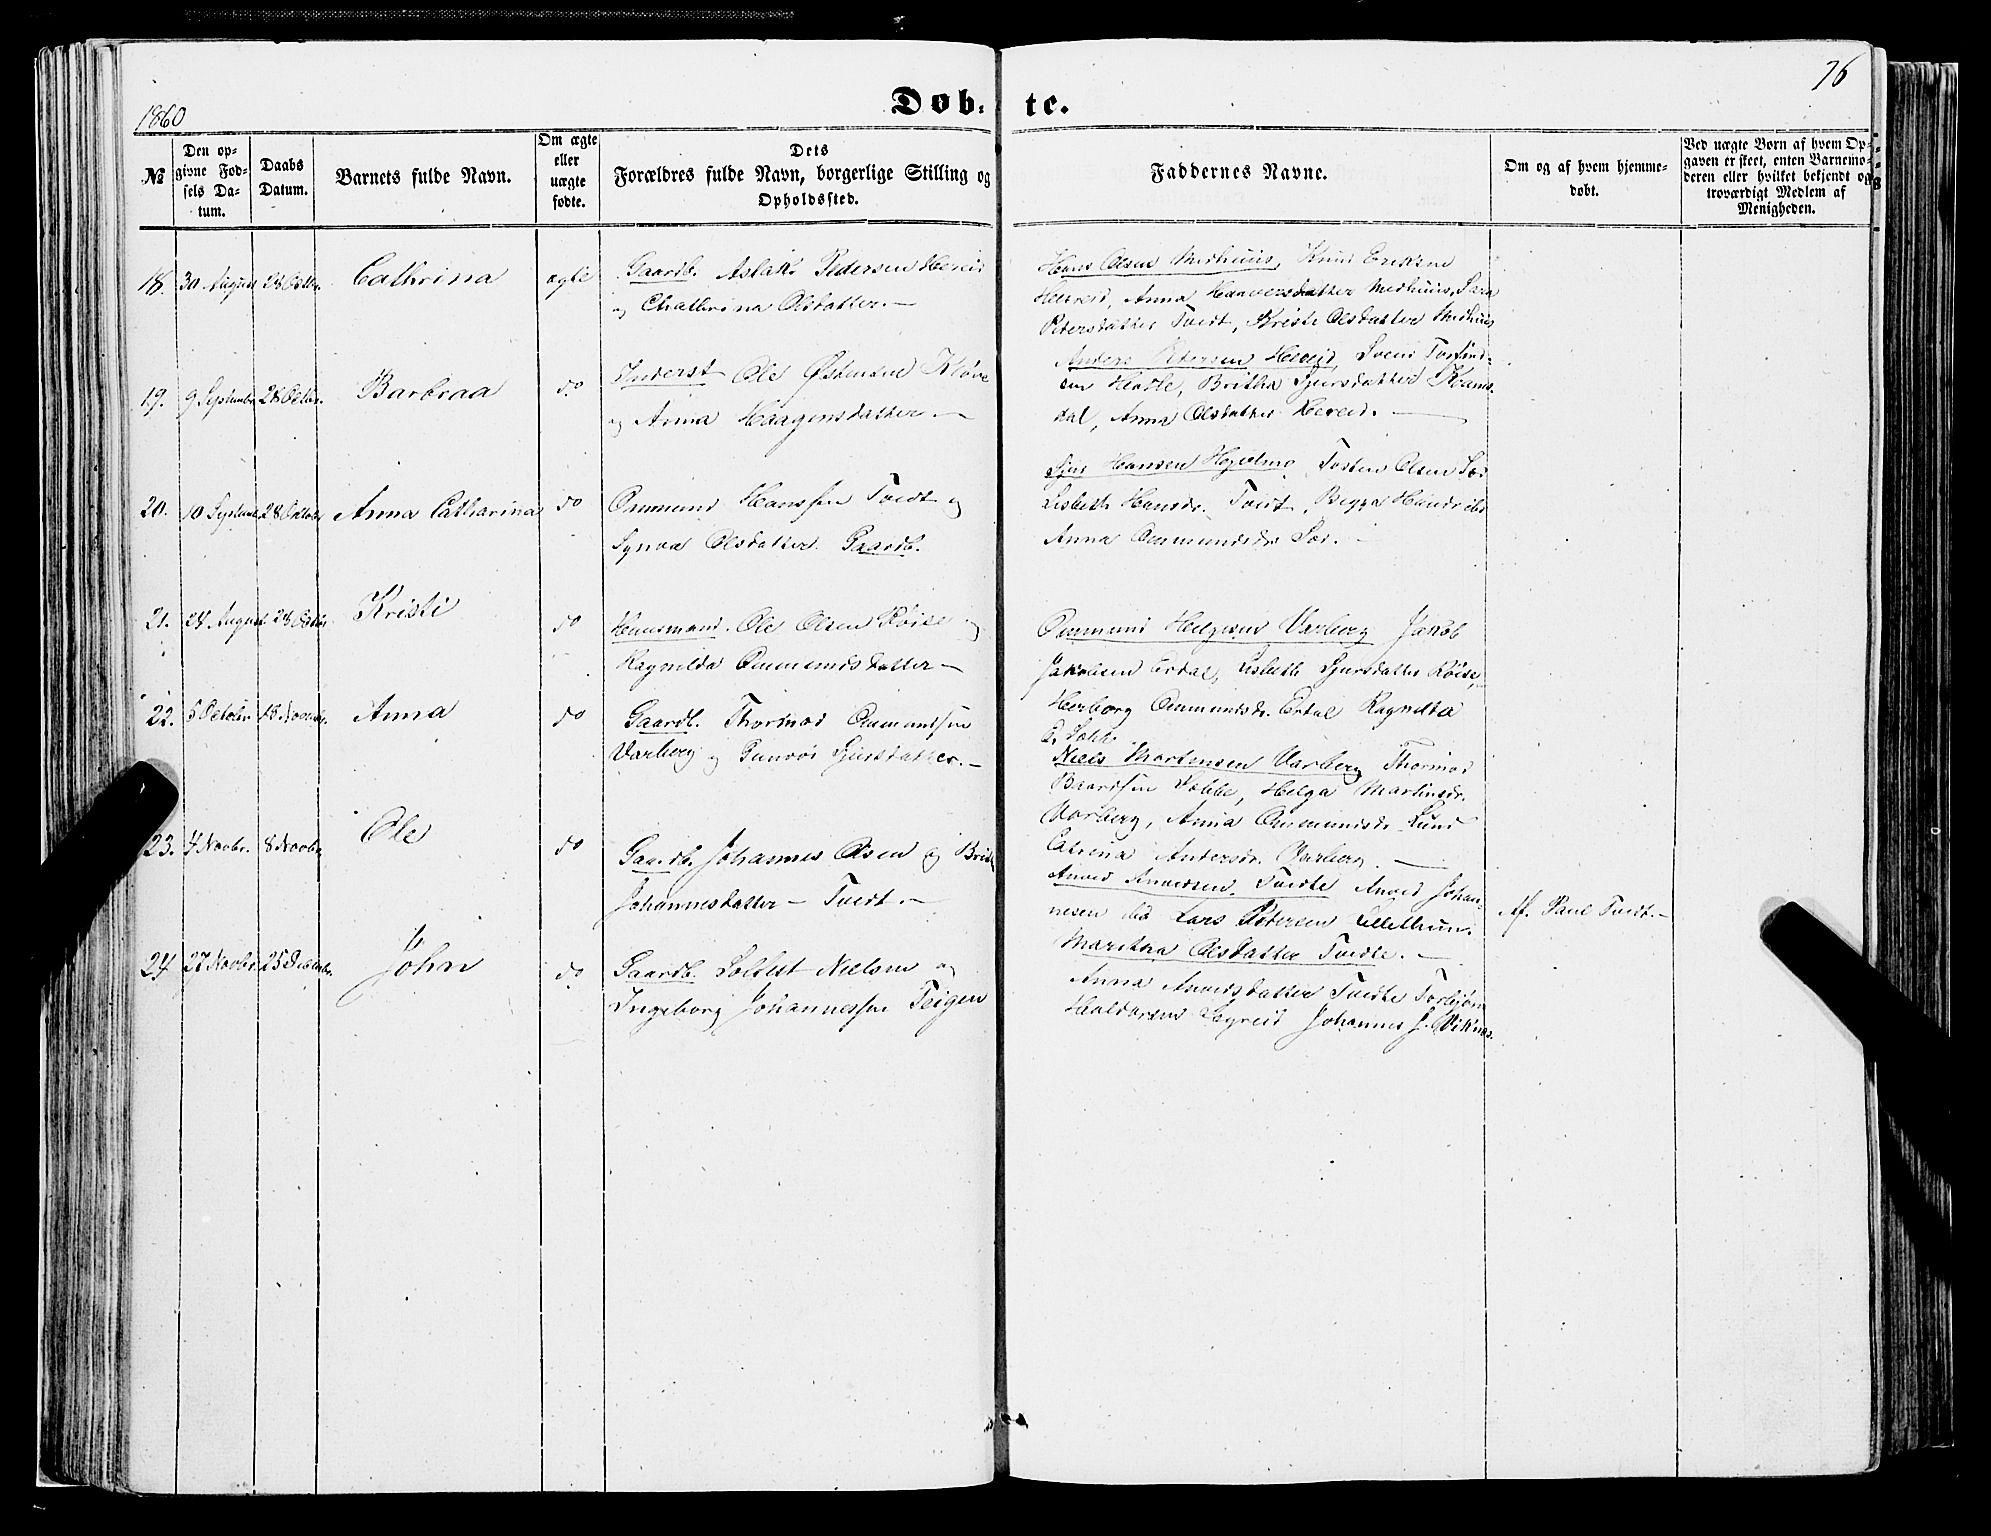 SAB, Ulvik sokneprestembete, H/Haa: Ministerialbok nr. A 13, 1853-1863, s. 76